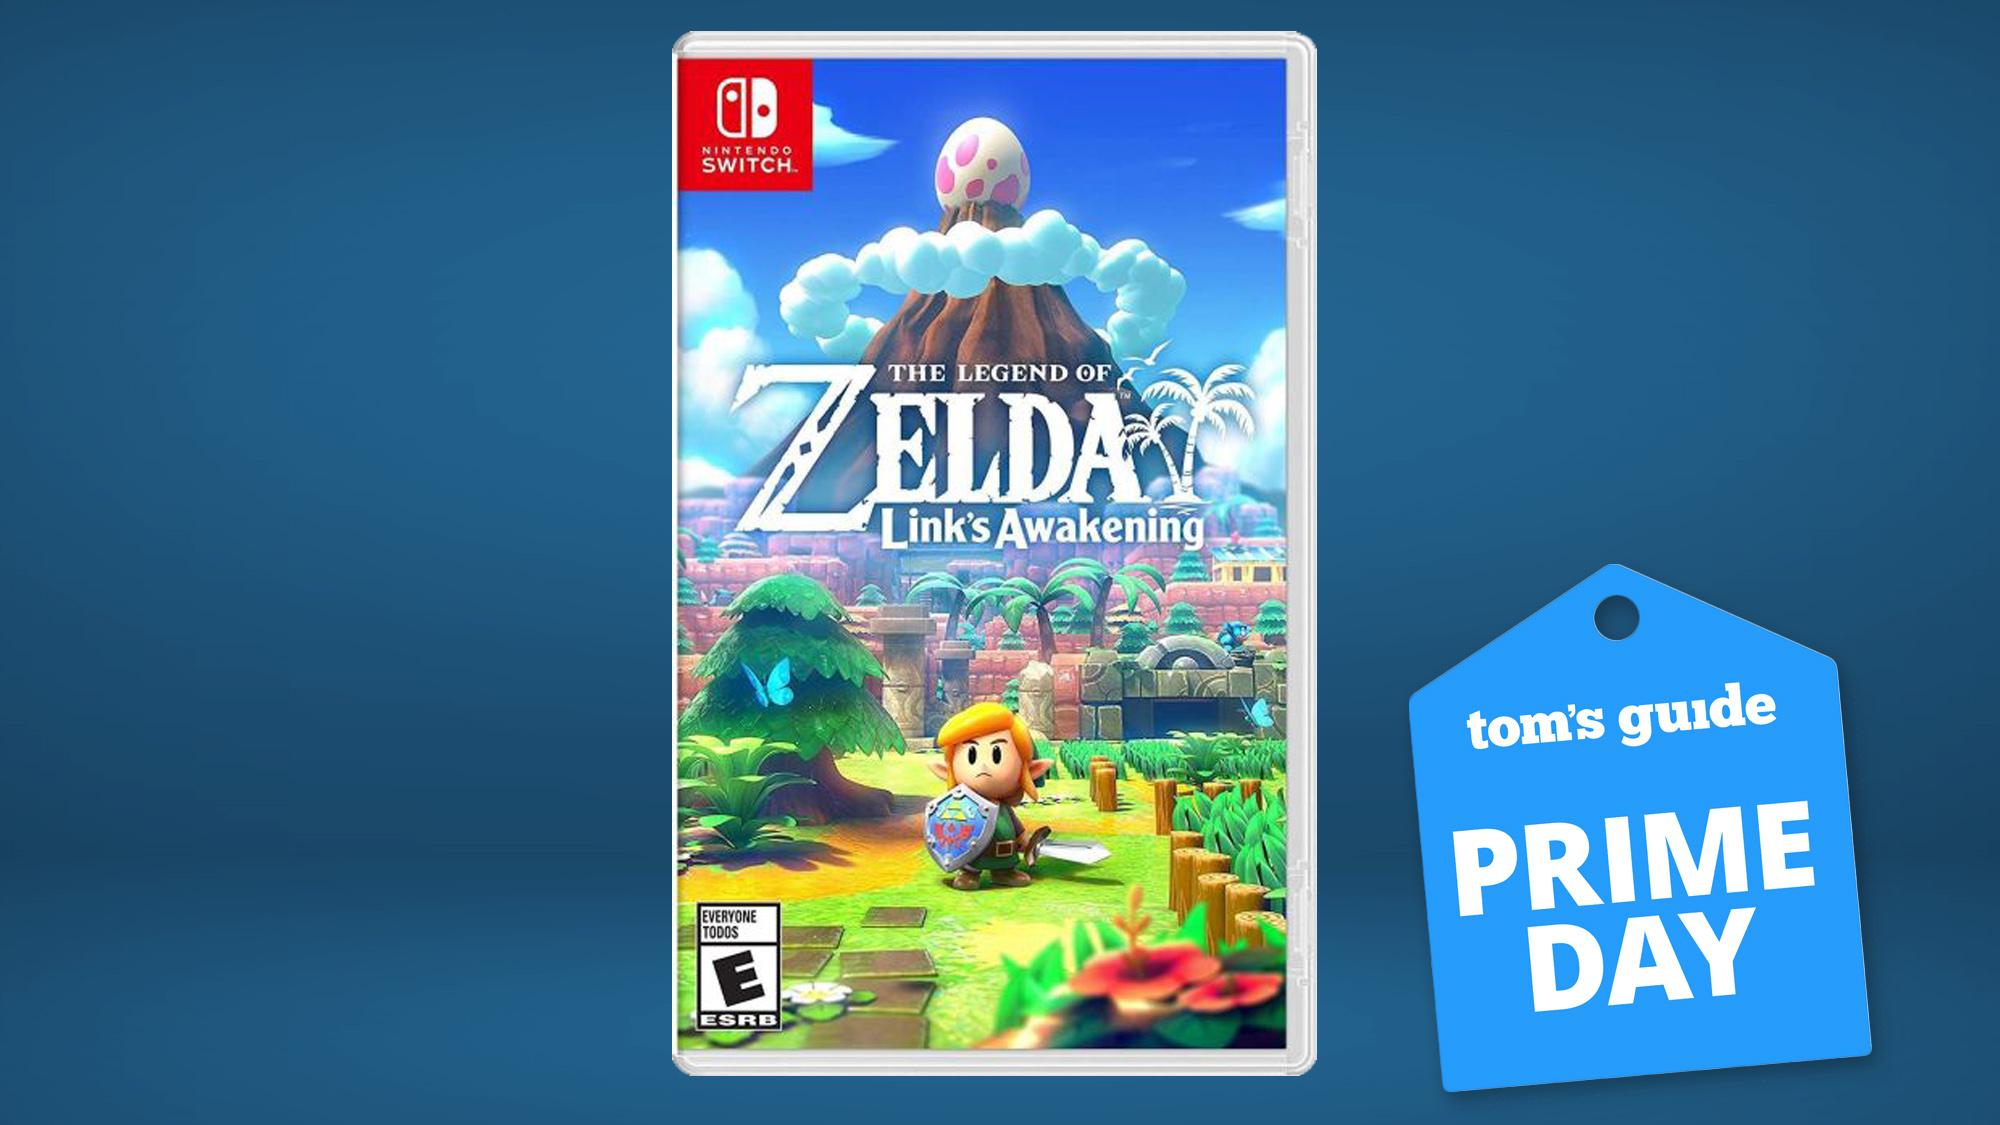 Zelda Link Awakening Prime Day